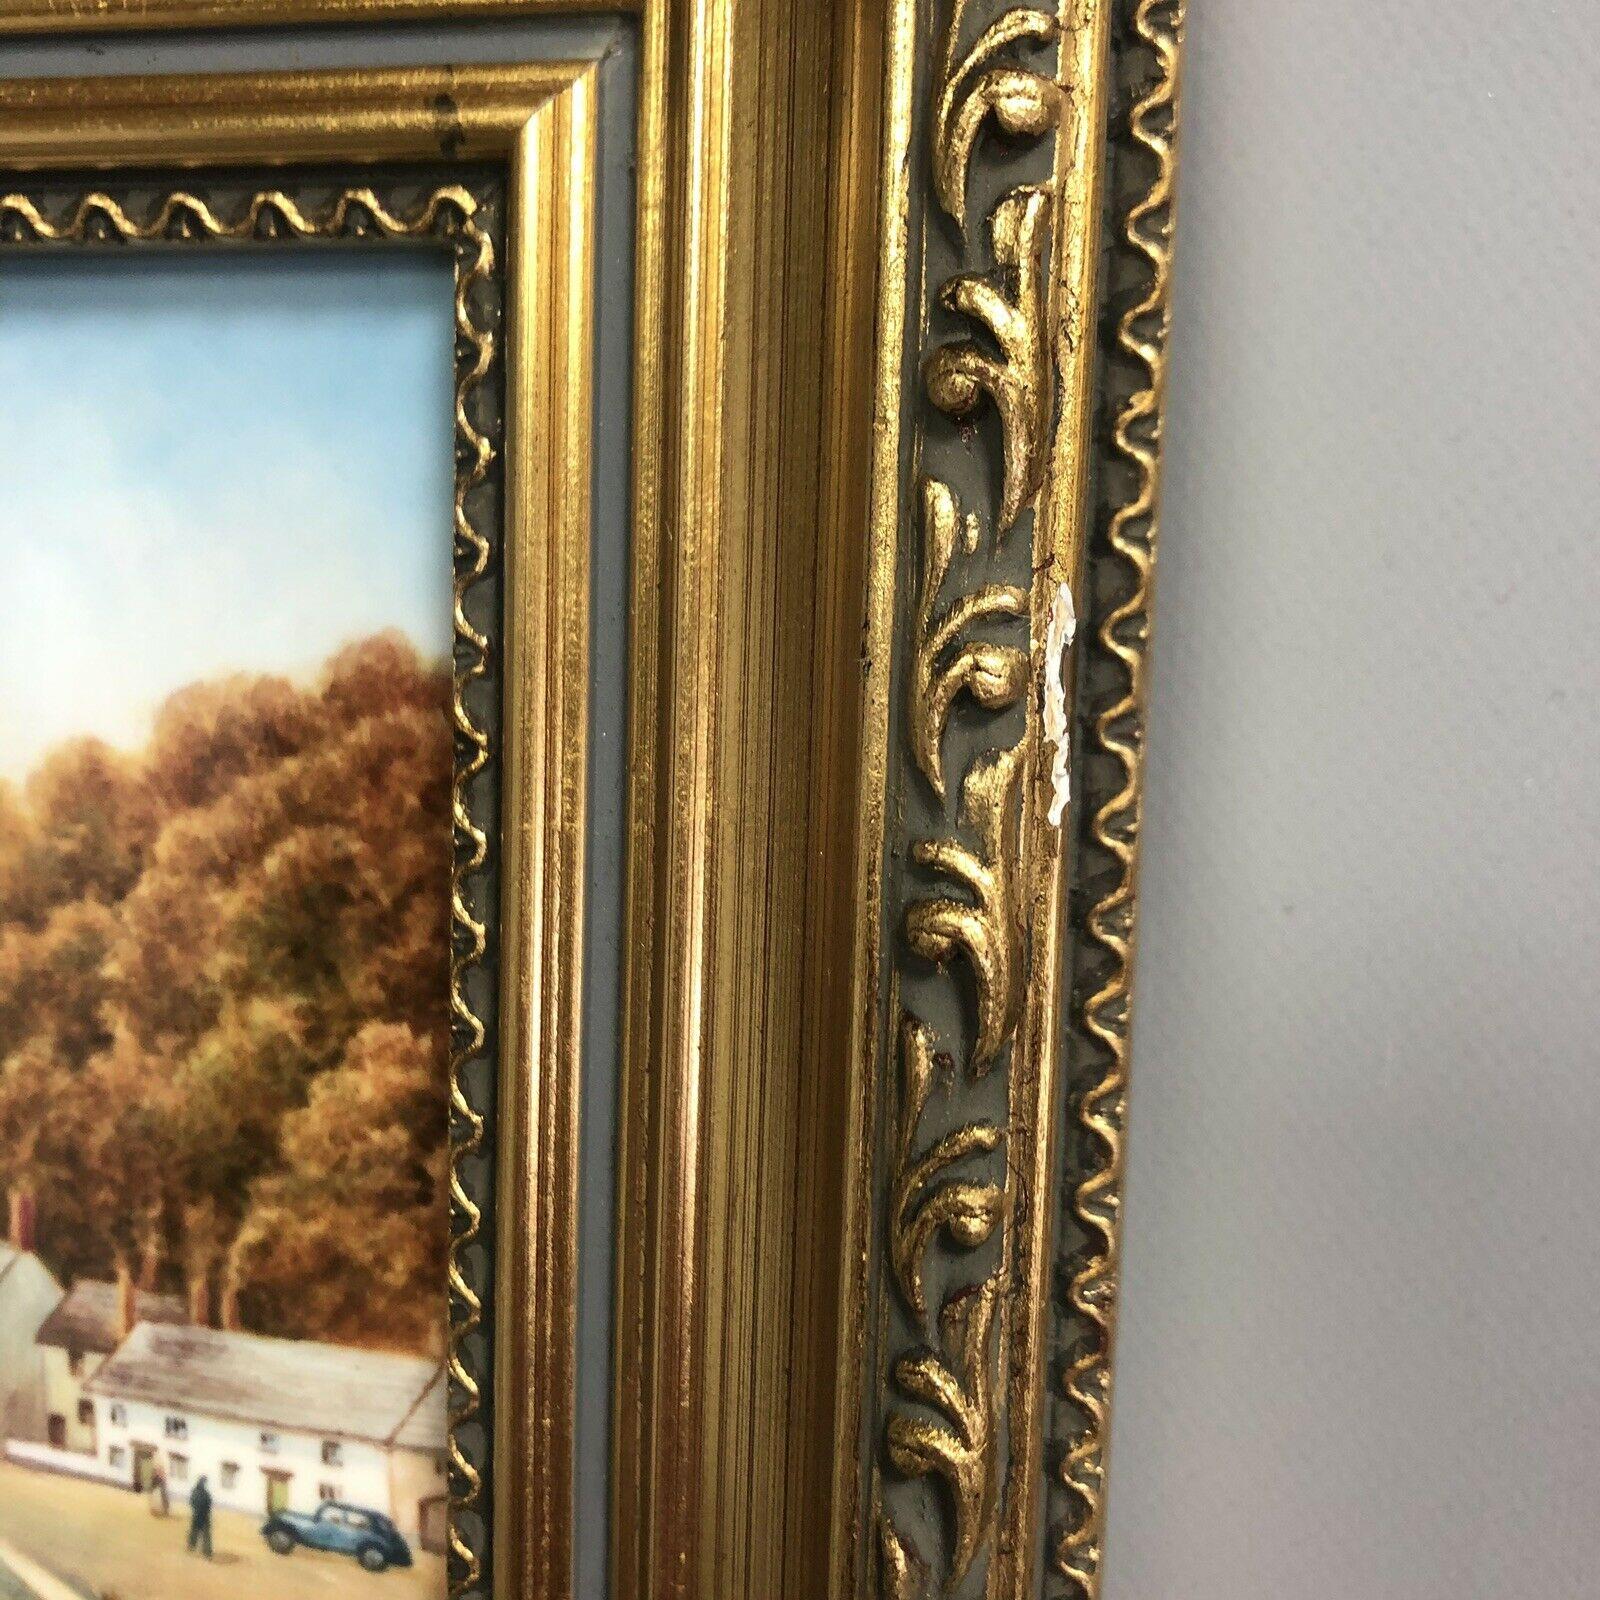 Lot 2 - Framed Porcelain Plaque Harbour Painted by Royal Worcester Artist Francis Clark